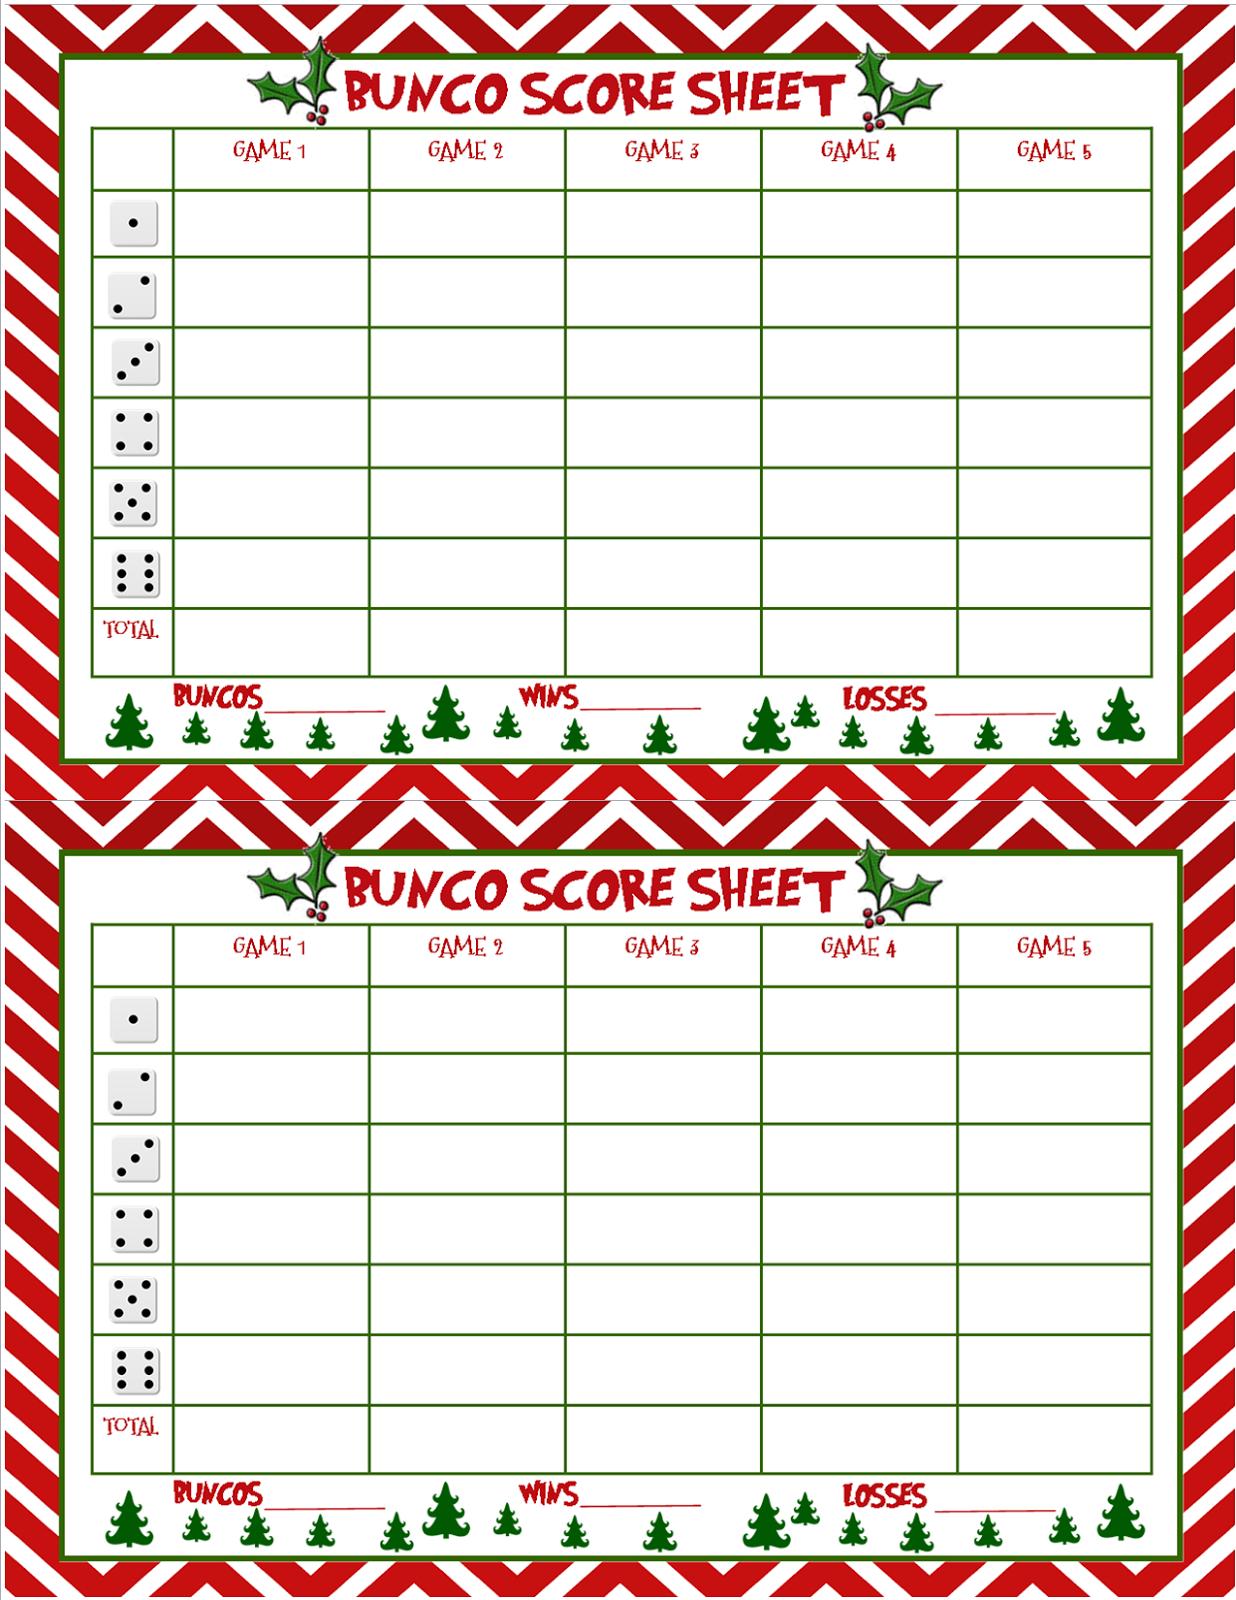 Christmas Bunco Score Sheets Free | Bunco | Bunco Score Sheets - Printable Bunco Score Cards Free